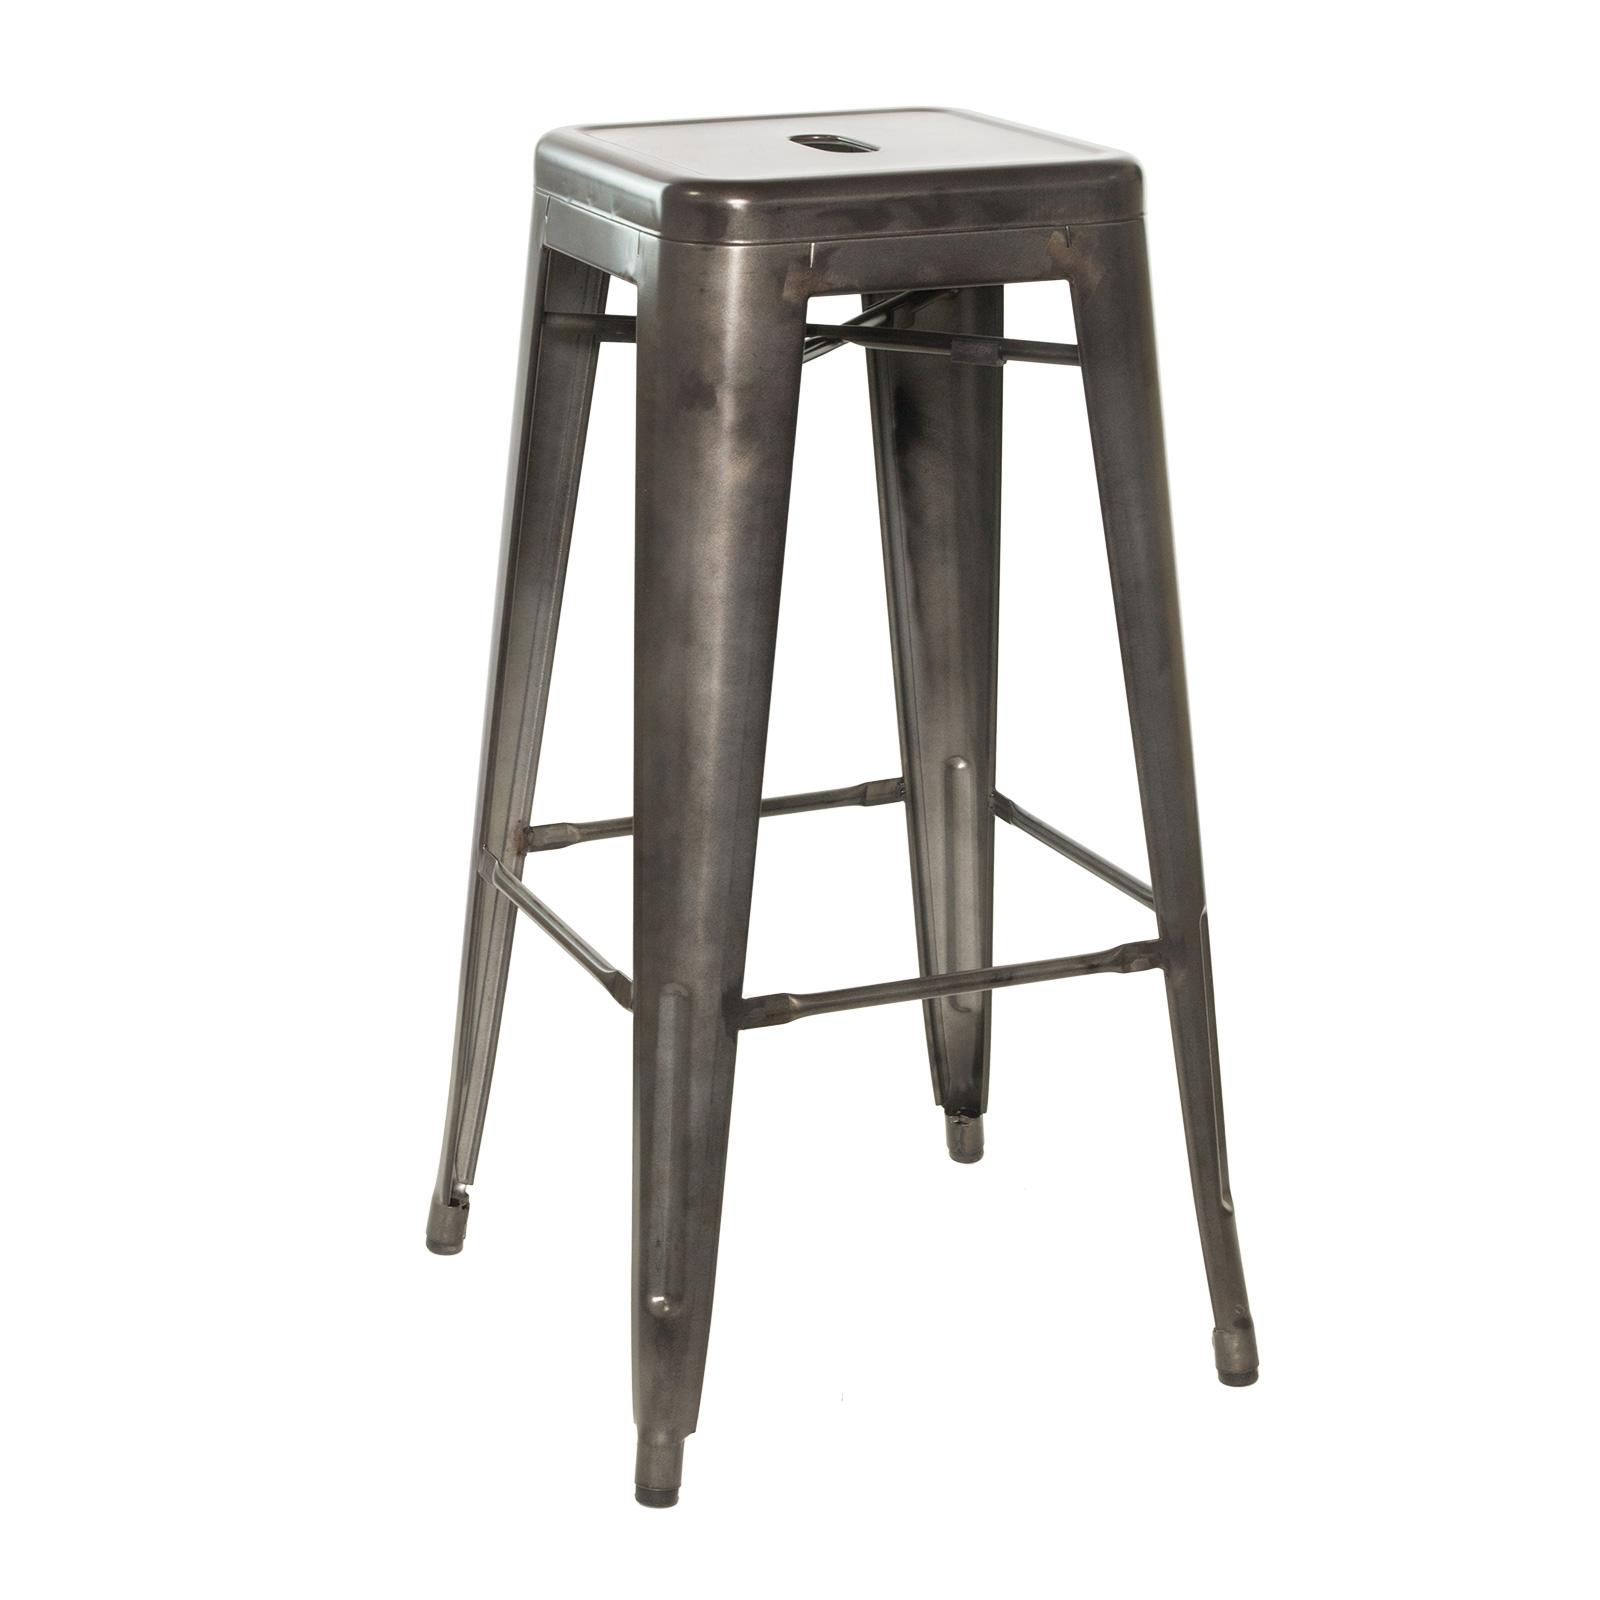 JustChair Manufacturing G42530X bar stool, outdoor